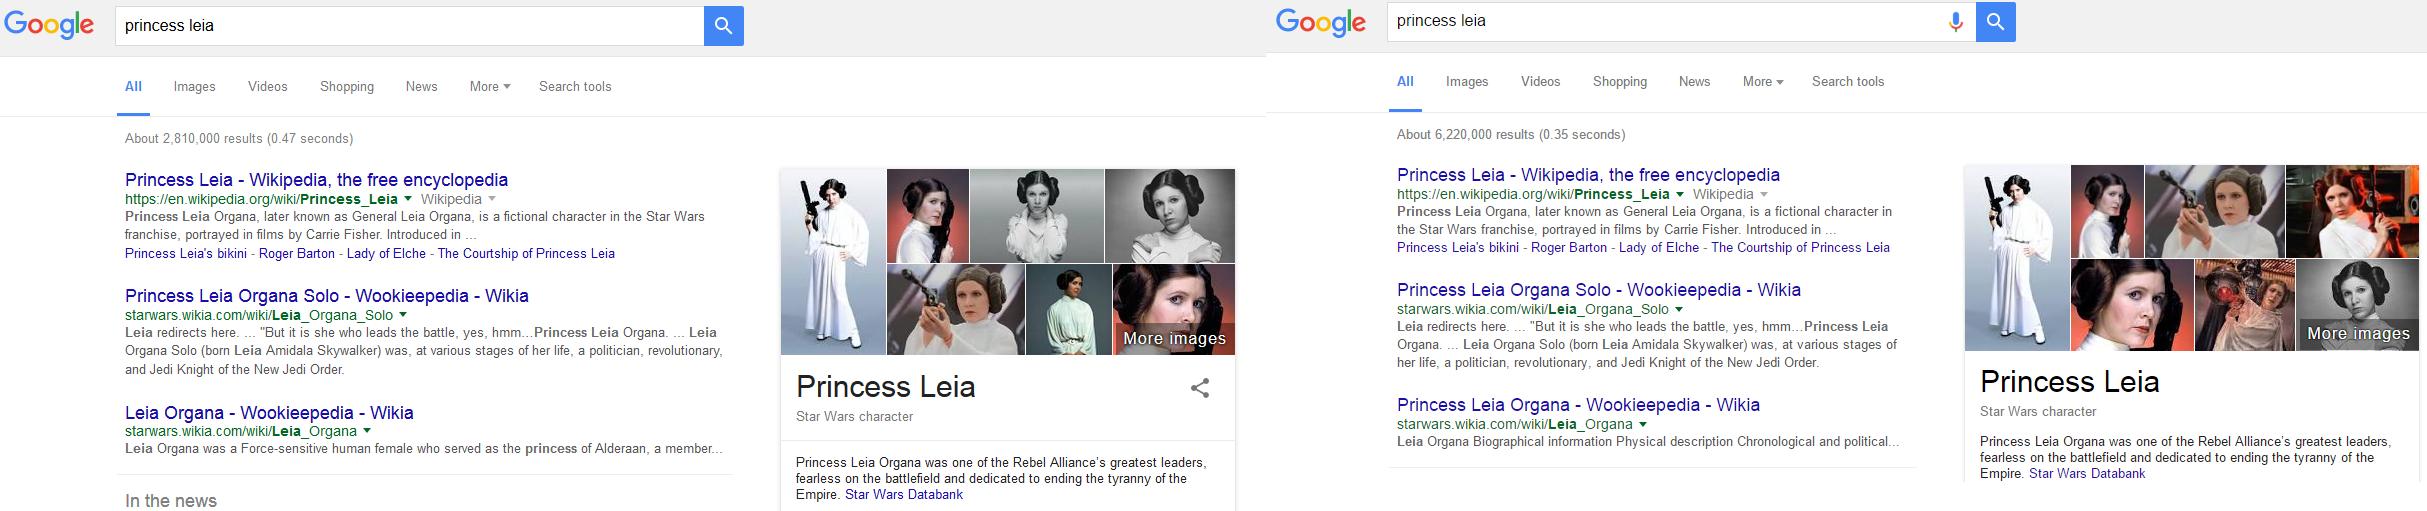 google search results new width comparison2